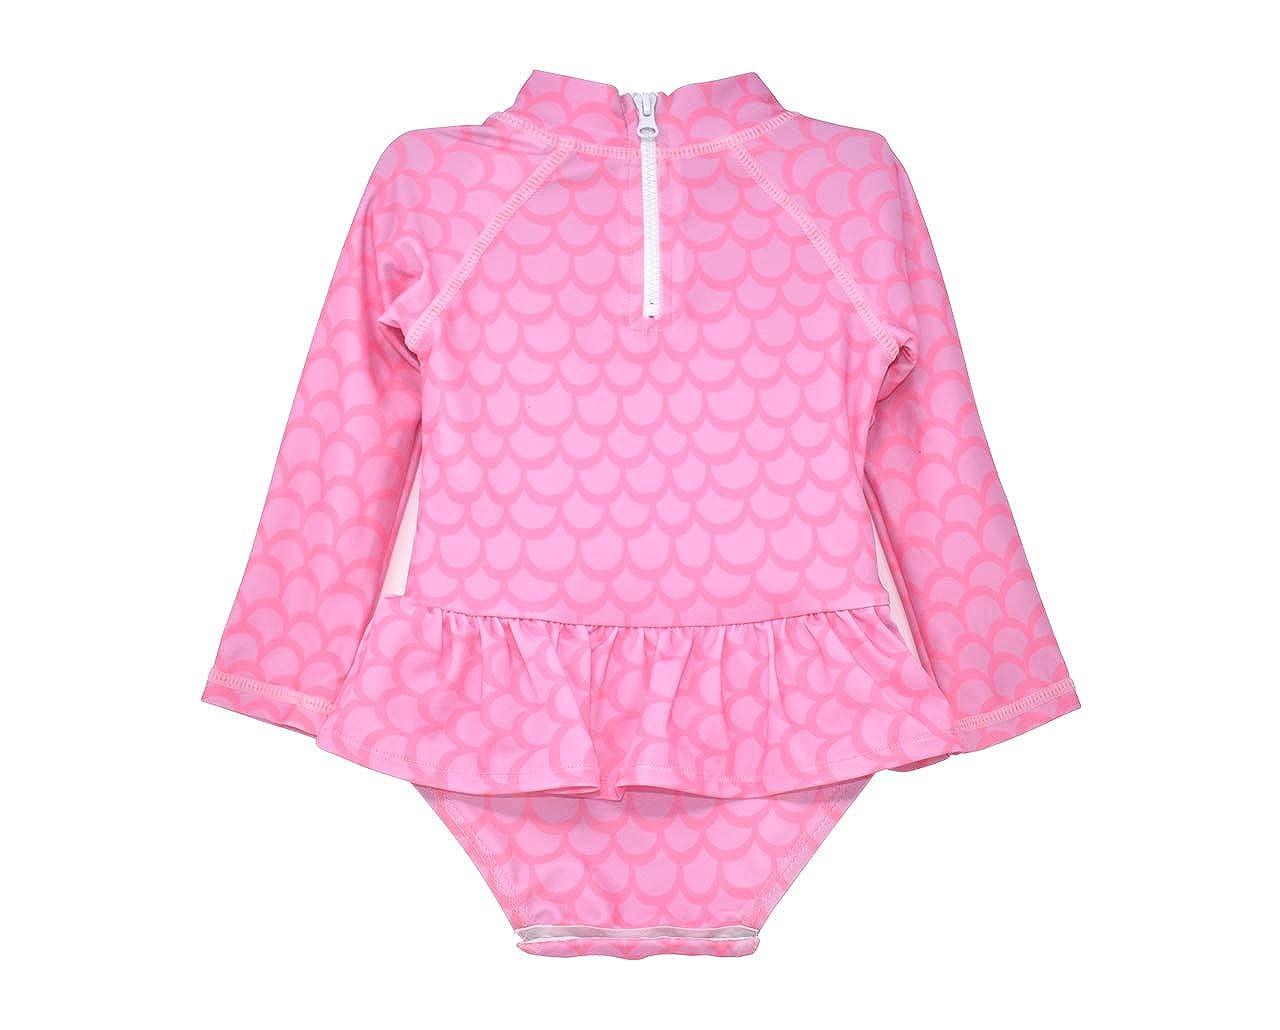 Alissa Infant Rash Guard Swimsuit Flap Happy Girls Baby UPF 50